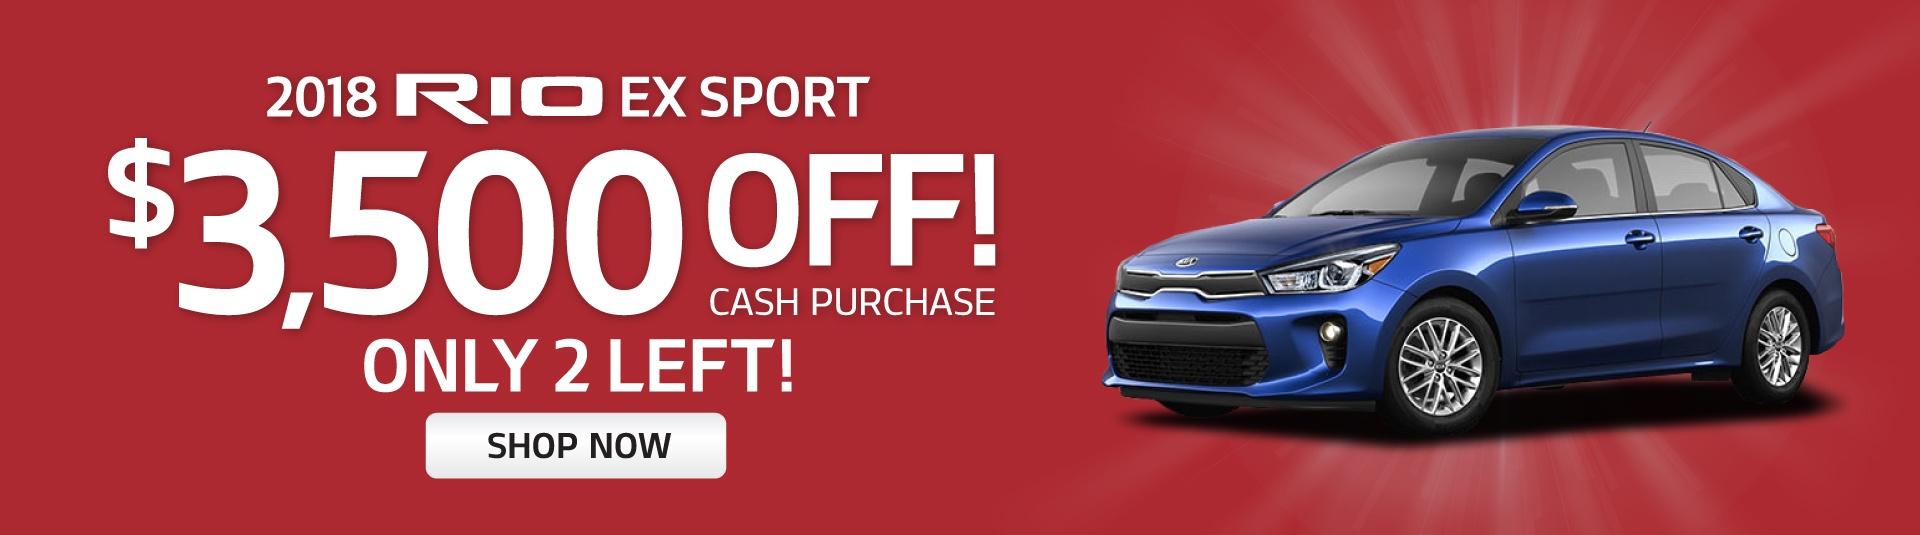 2018 Kia Rio Ex Sport $3500OFF Cash Rebate